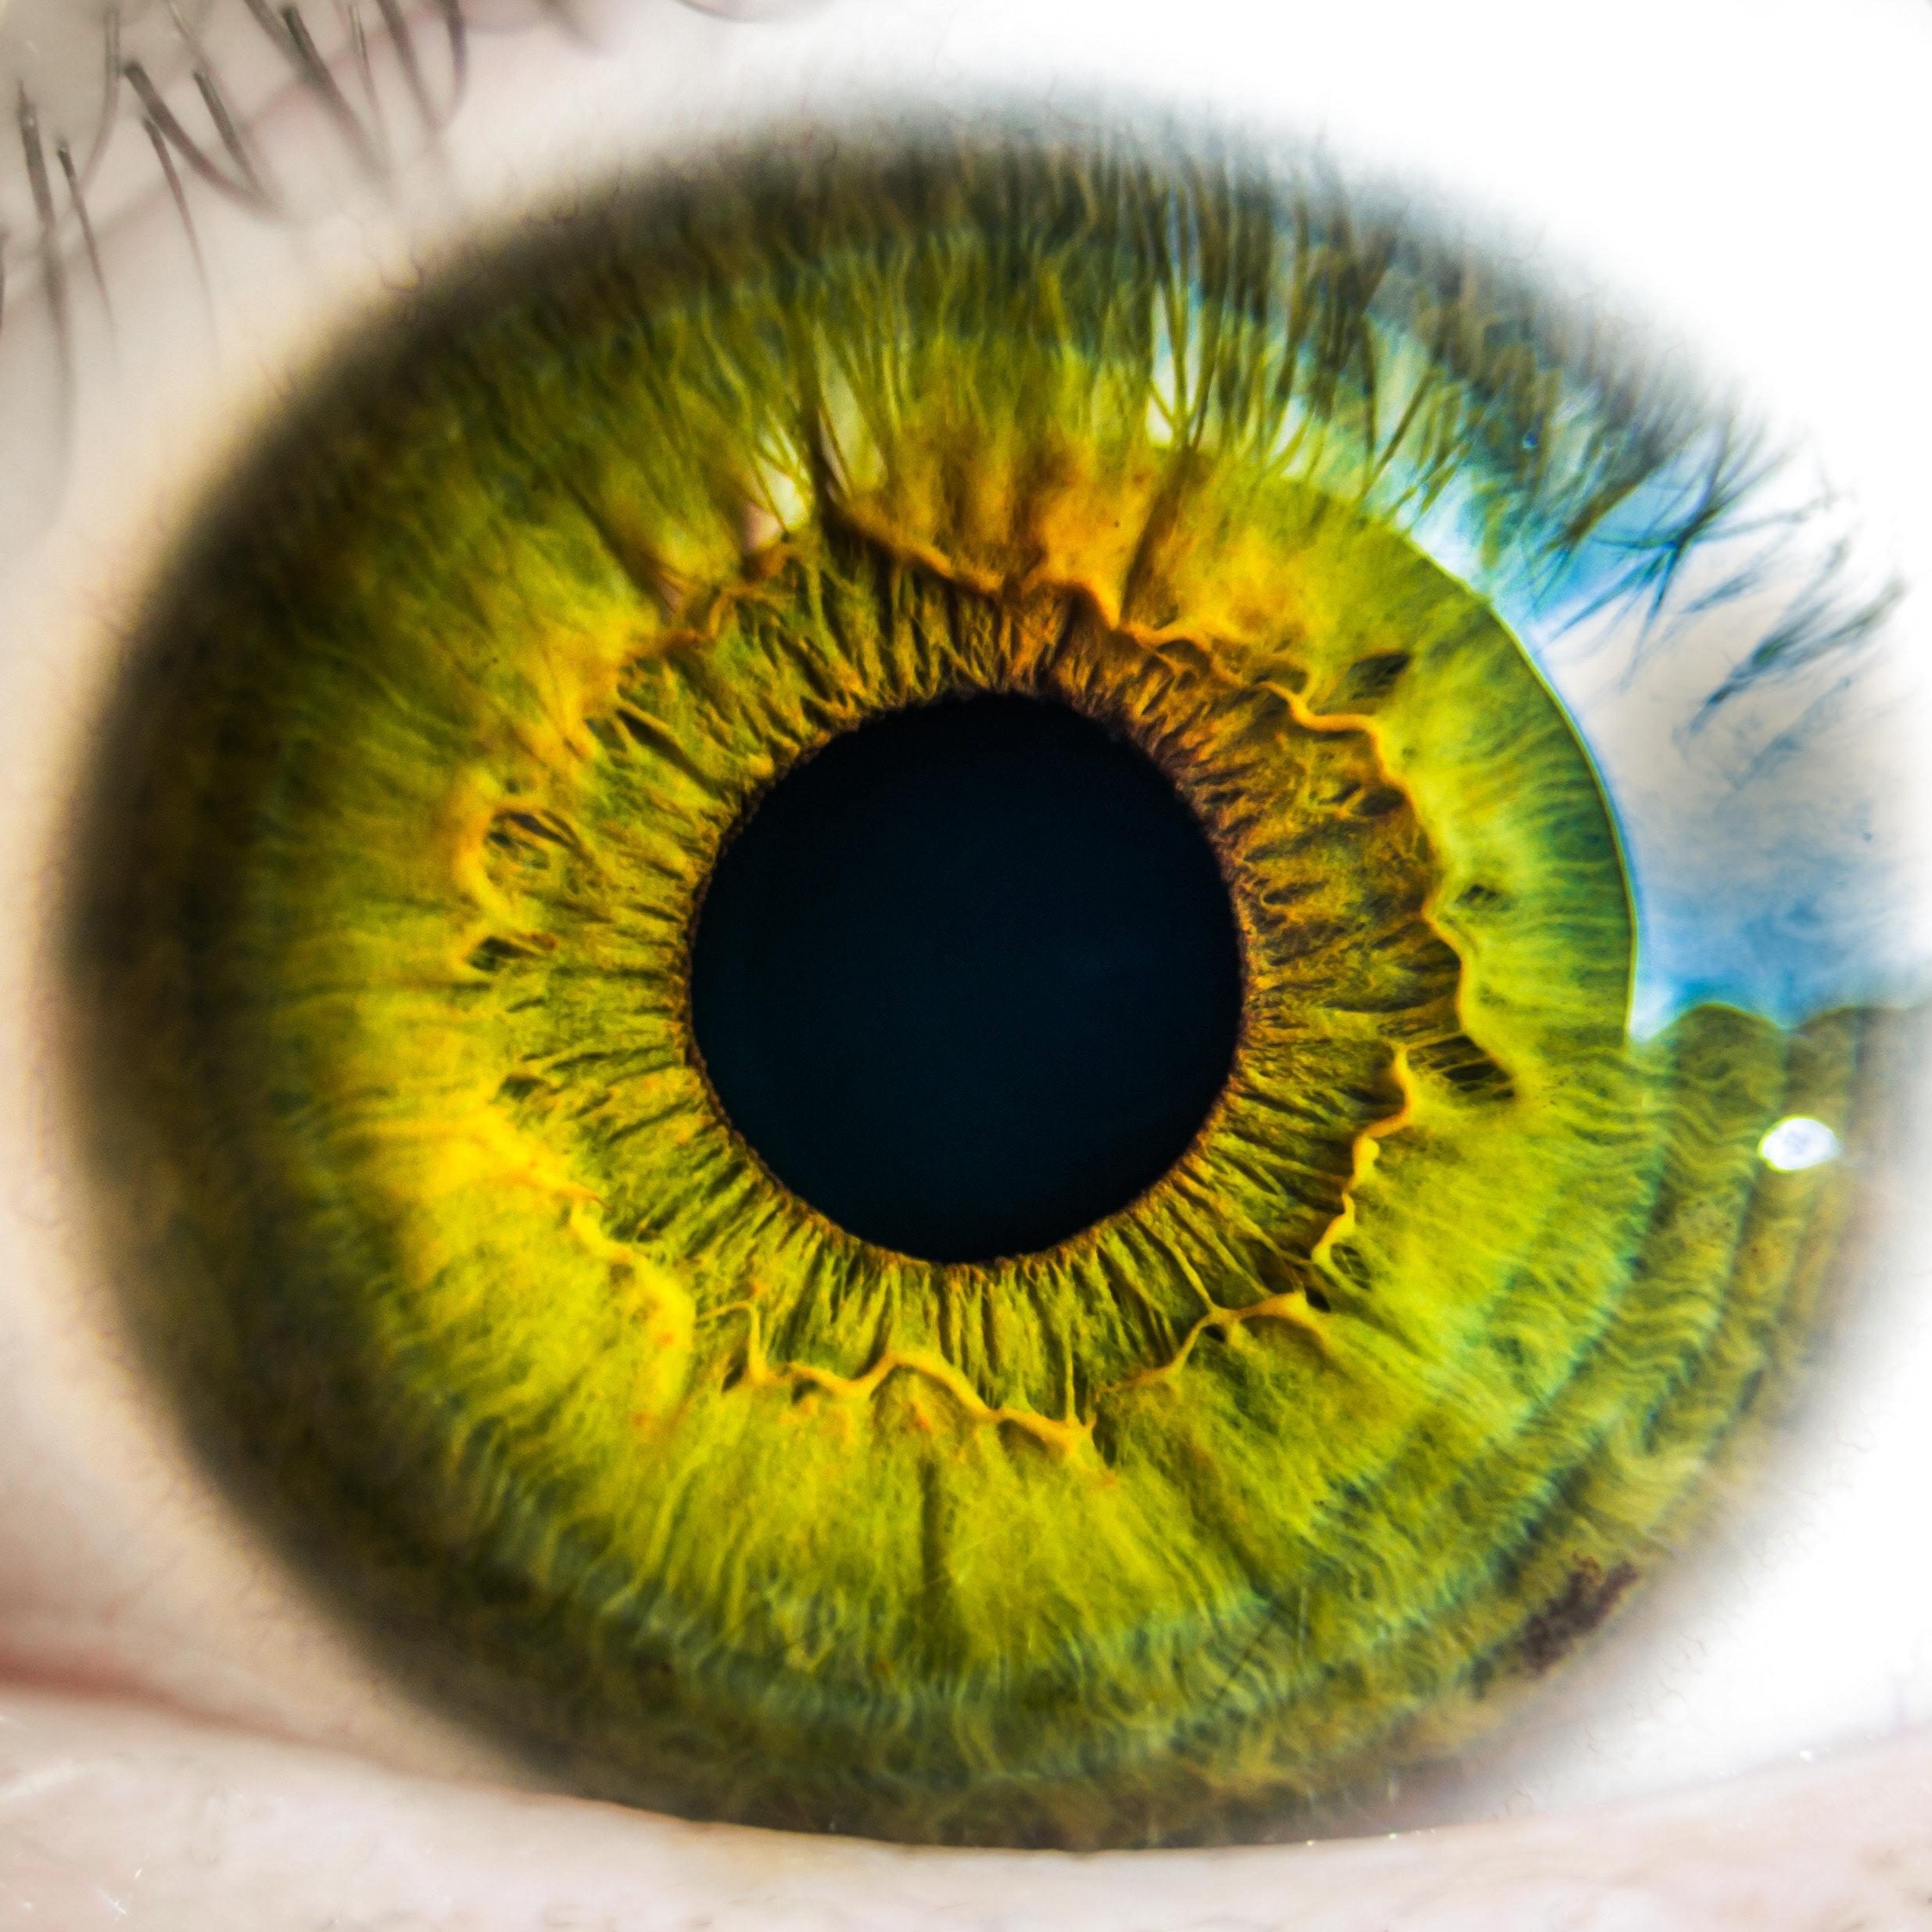 anatomy-biology-eye-8588.jpg